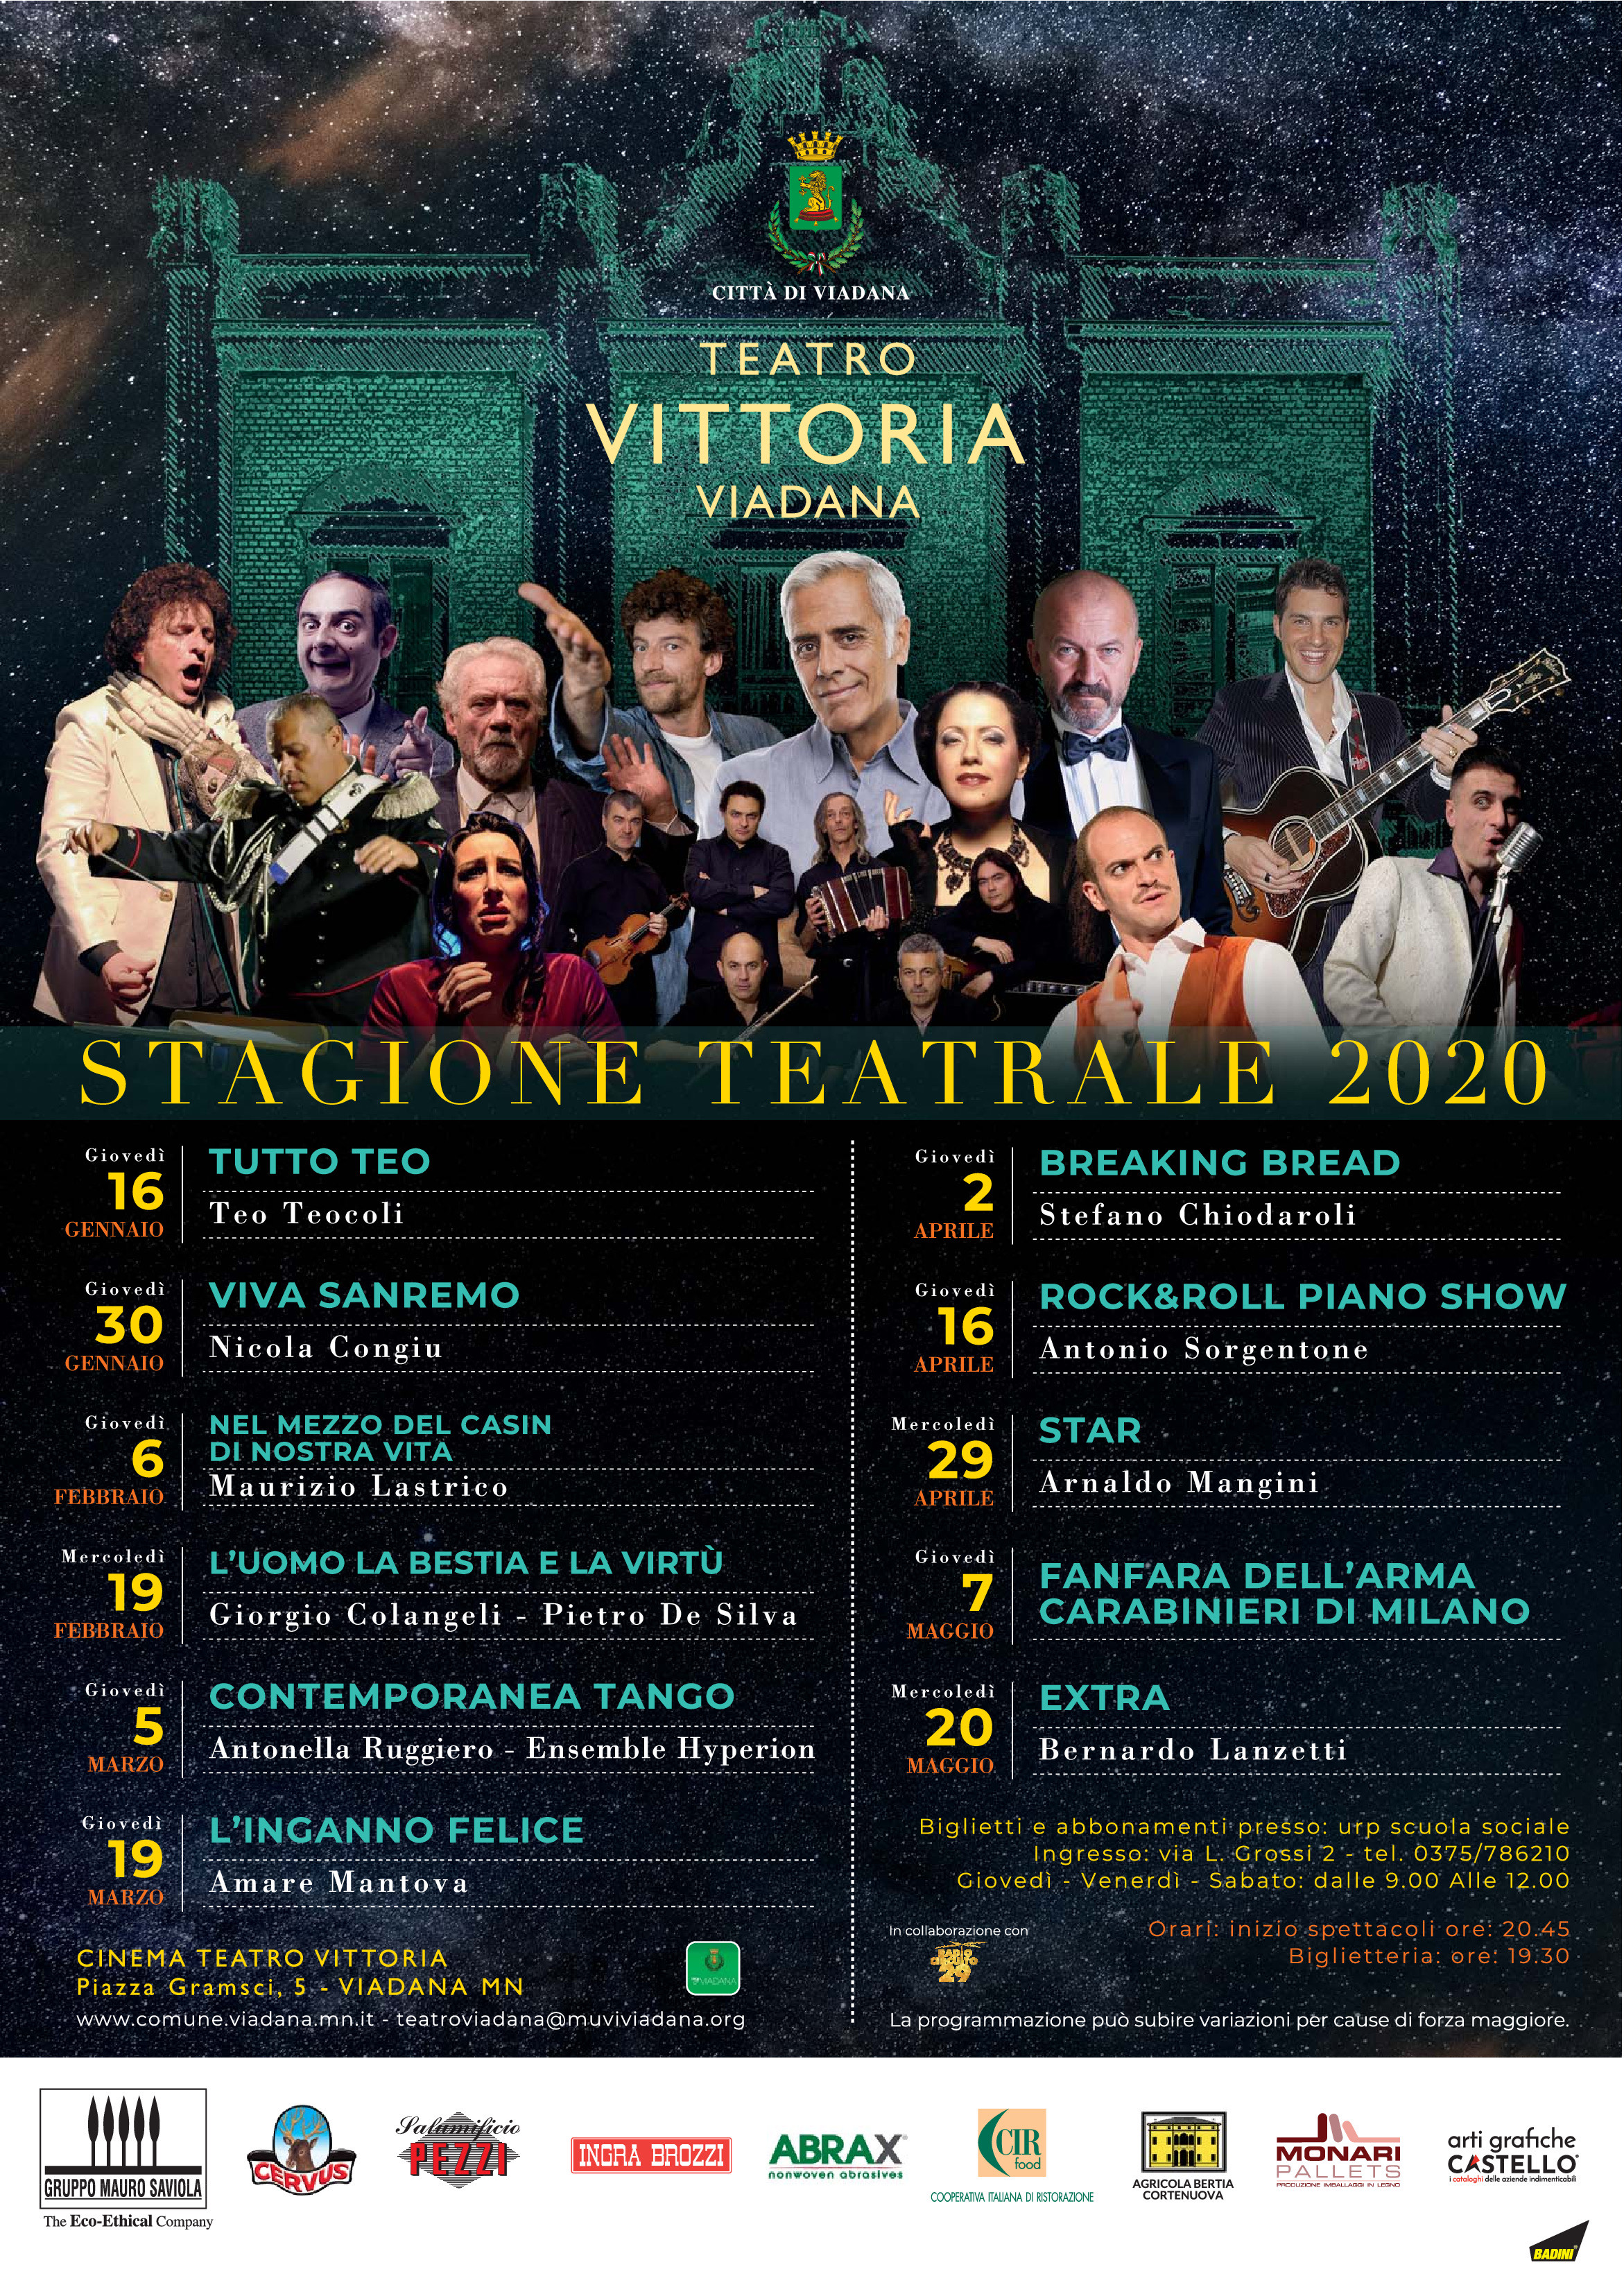 19/02/2020 - GIORGIO COLANGELI - PIETRO DE SILVA